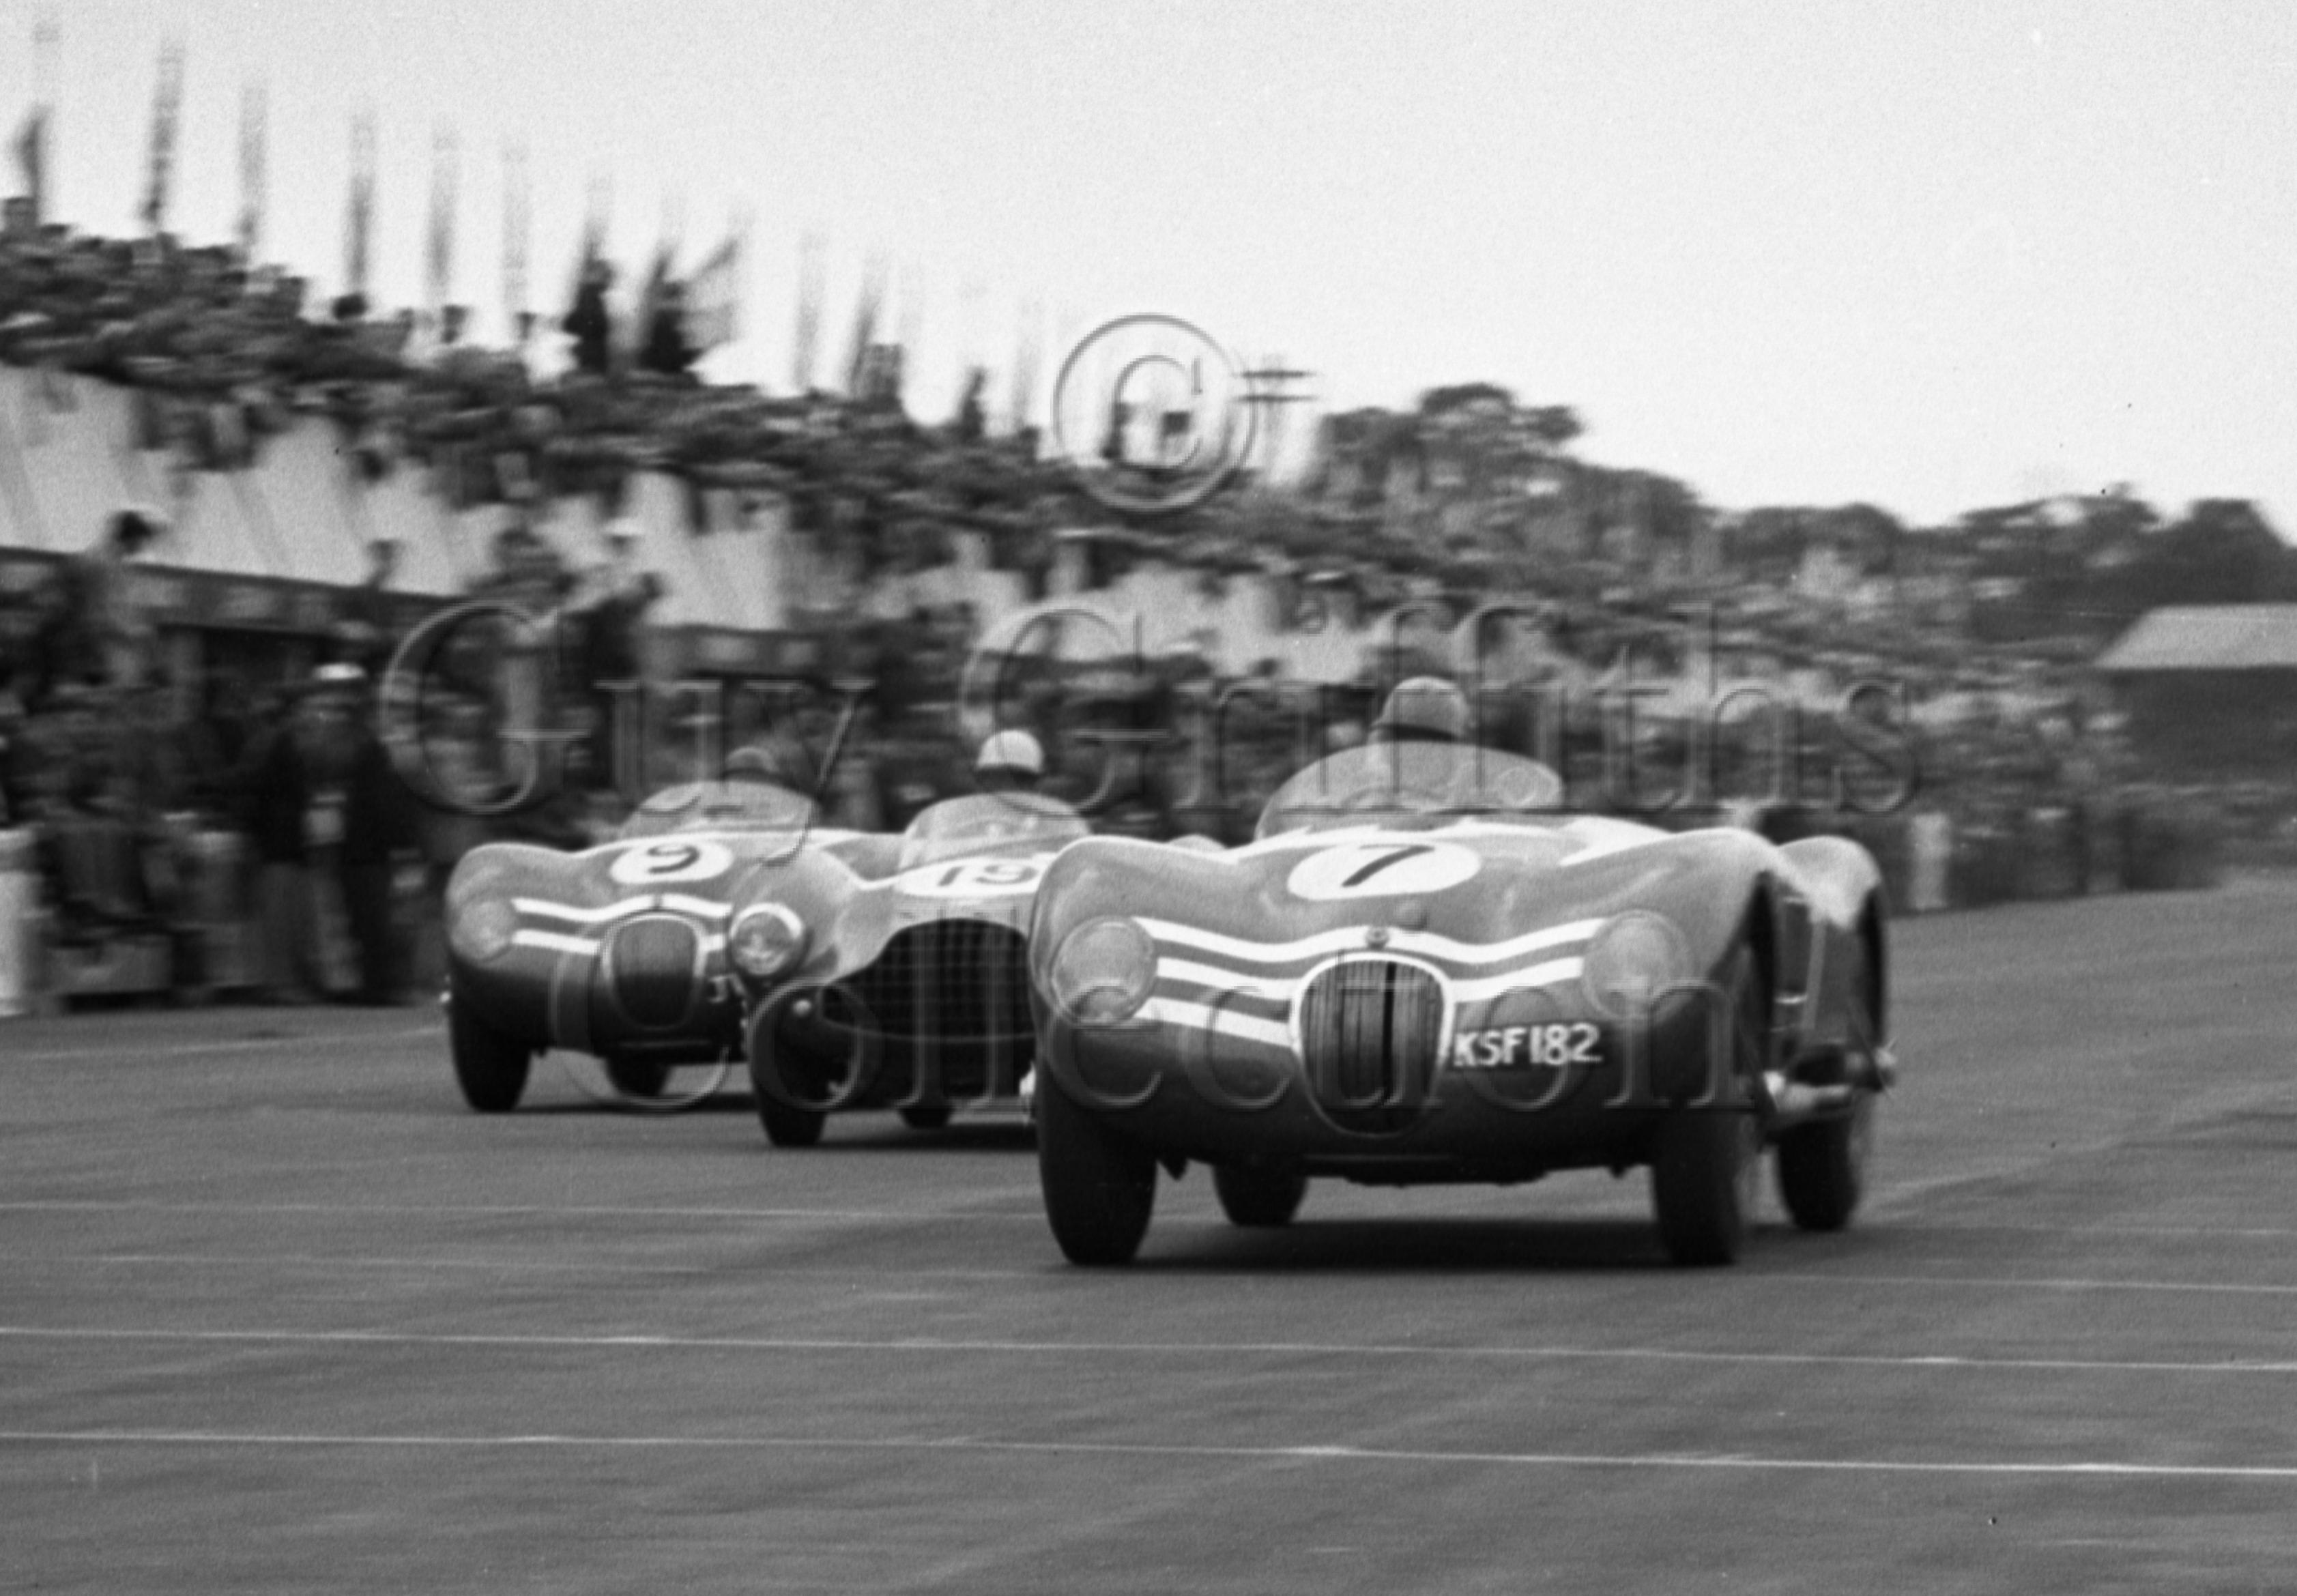 74-53–N-Sanderson–Ecurie-Ecosse-Jaguar-C-Type-KSF-182–Silverstone–18-07-1953.jpg - Guy Griffiths Collection